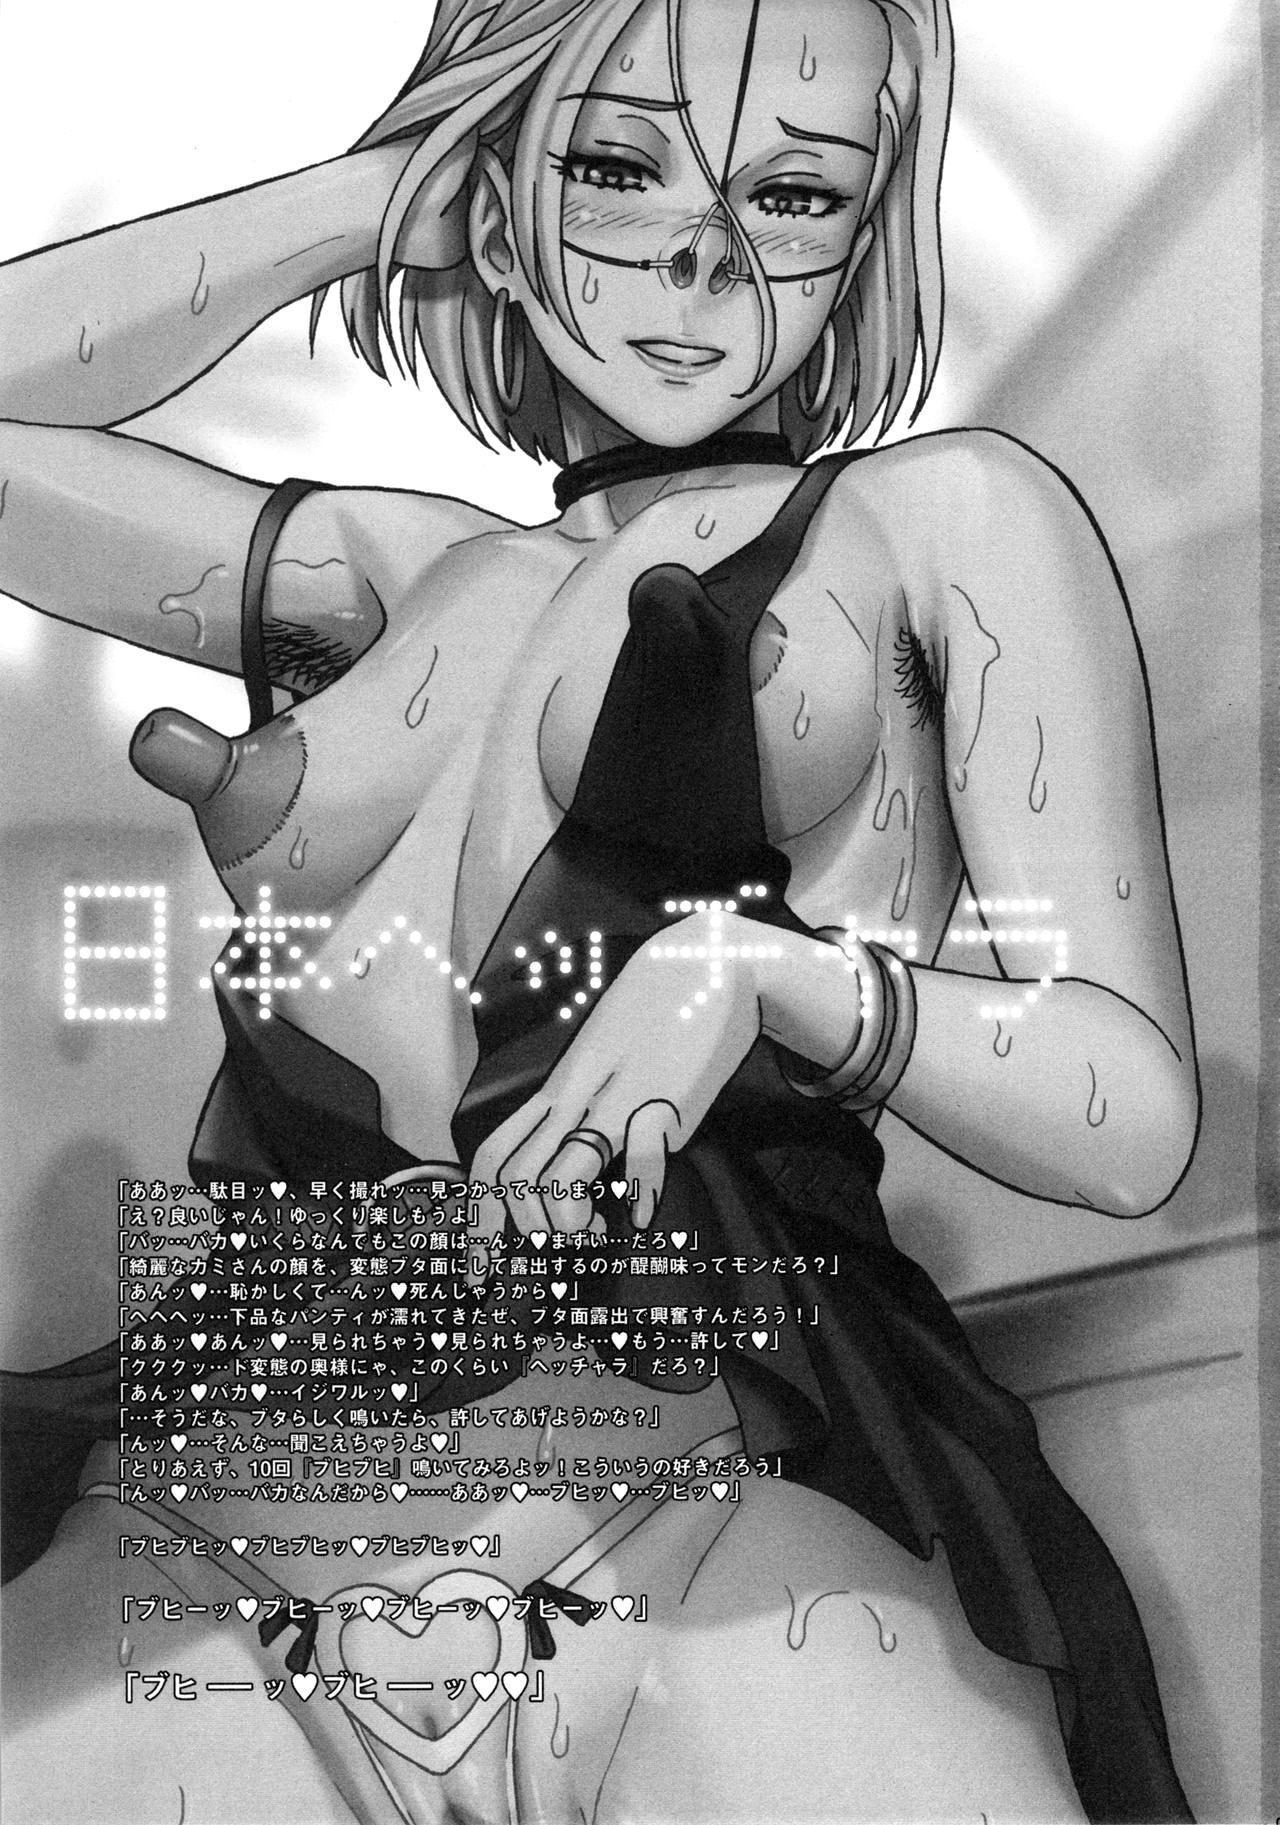 (C87) [Niku Ringo (Kakugari Kyoudai)] NIPPON HEAD-CHA-LA (Dragon Ball Z) [English] [SaHa] [Decensored] 1